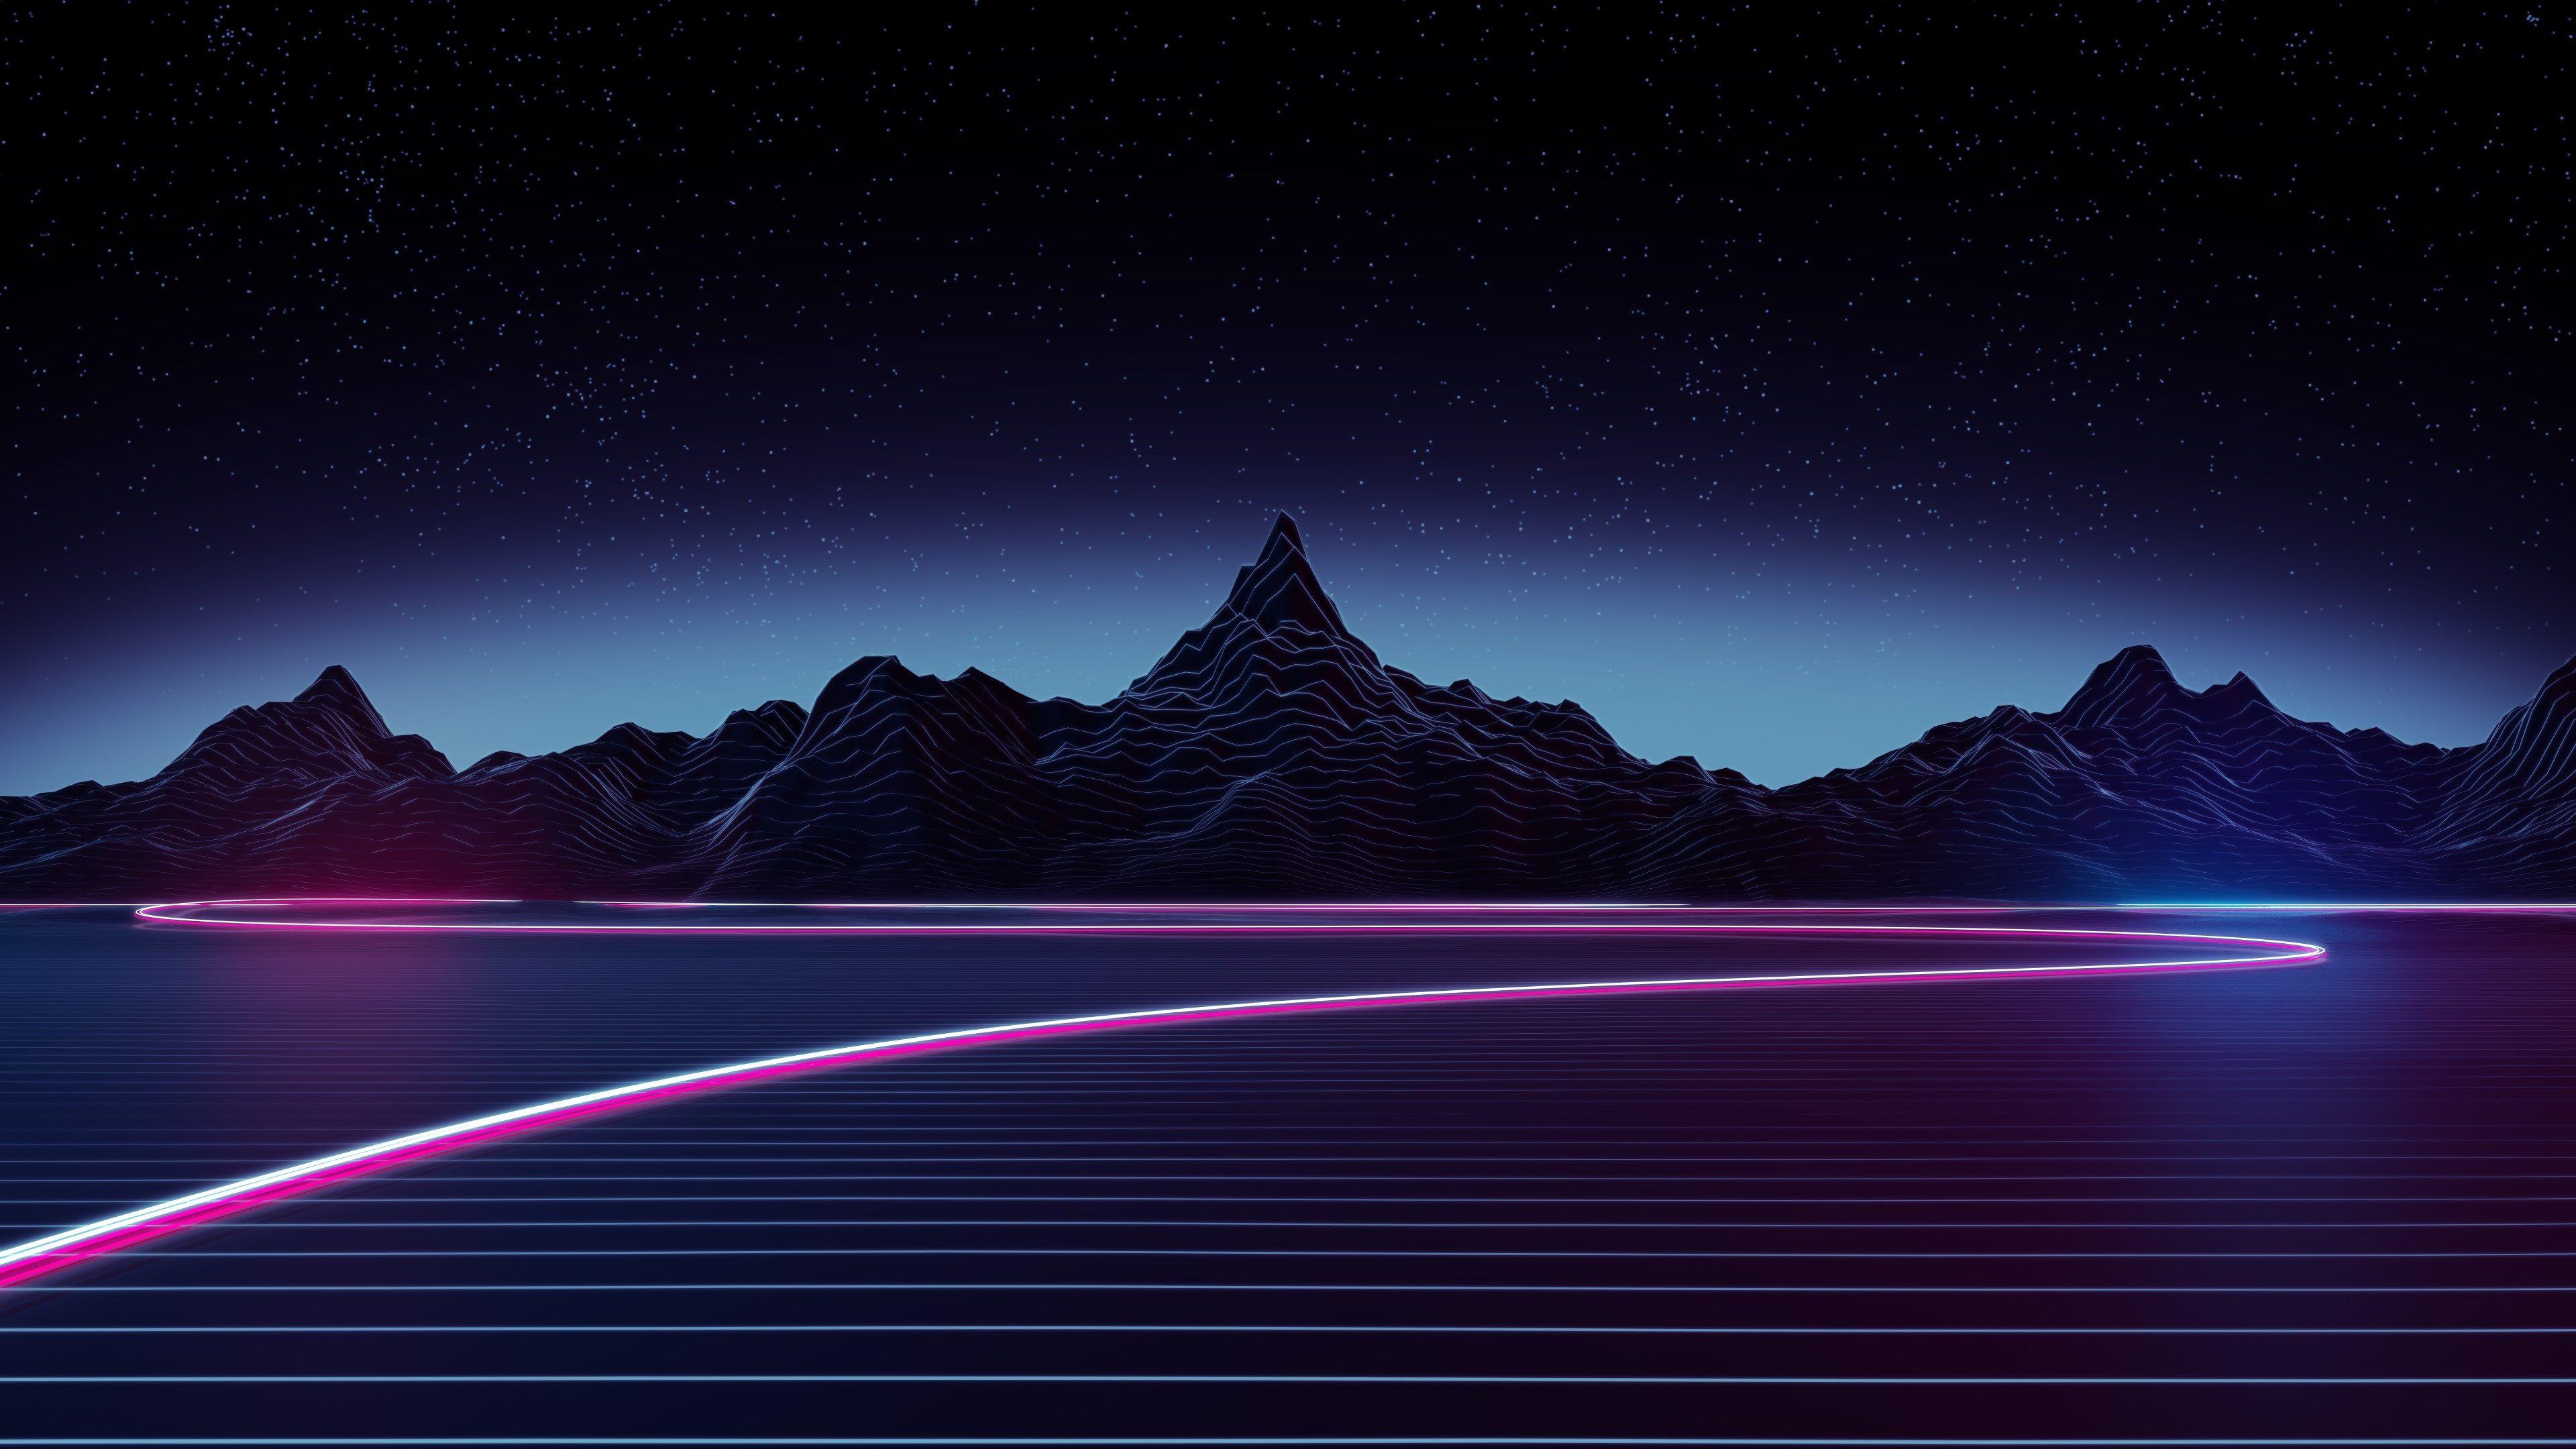 3840x2160 Neon 4k Free Pc Wallpaper Hd Wallpapers Para Pc Papel De Parede Vaporwave Ondas Retro